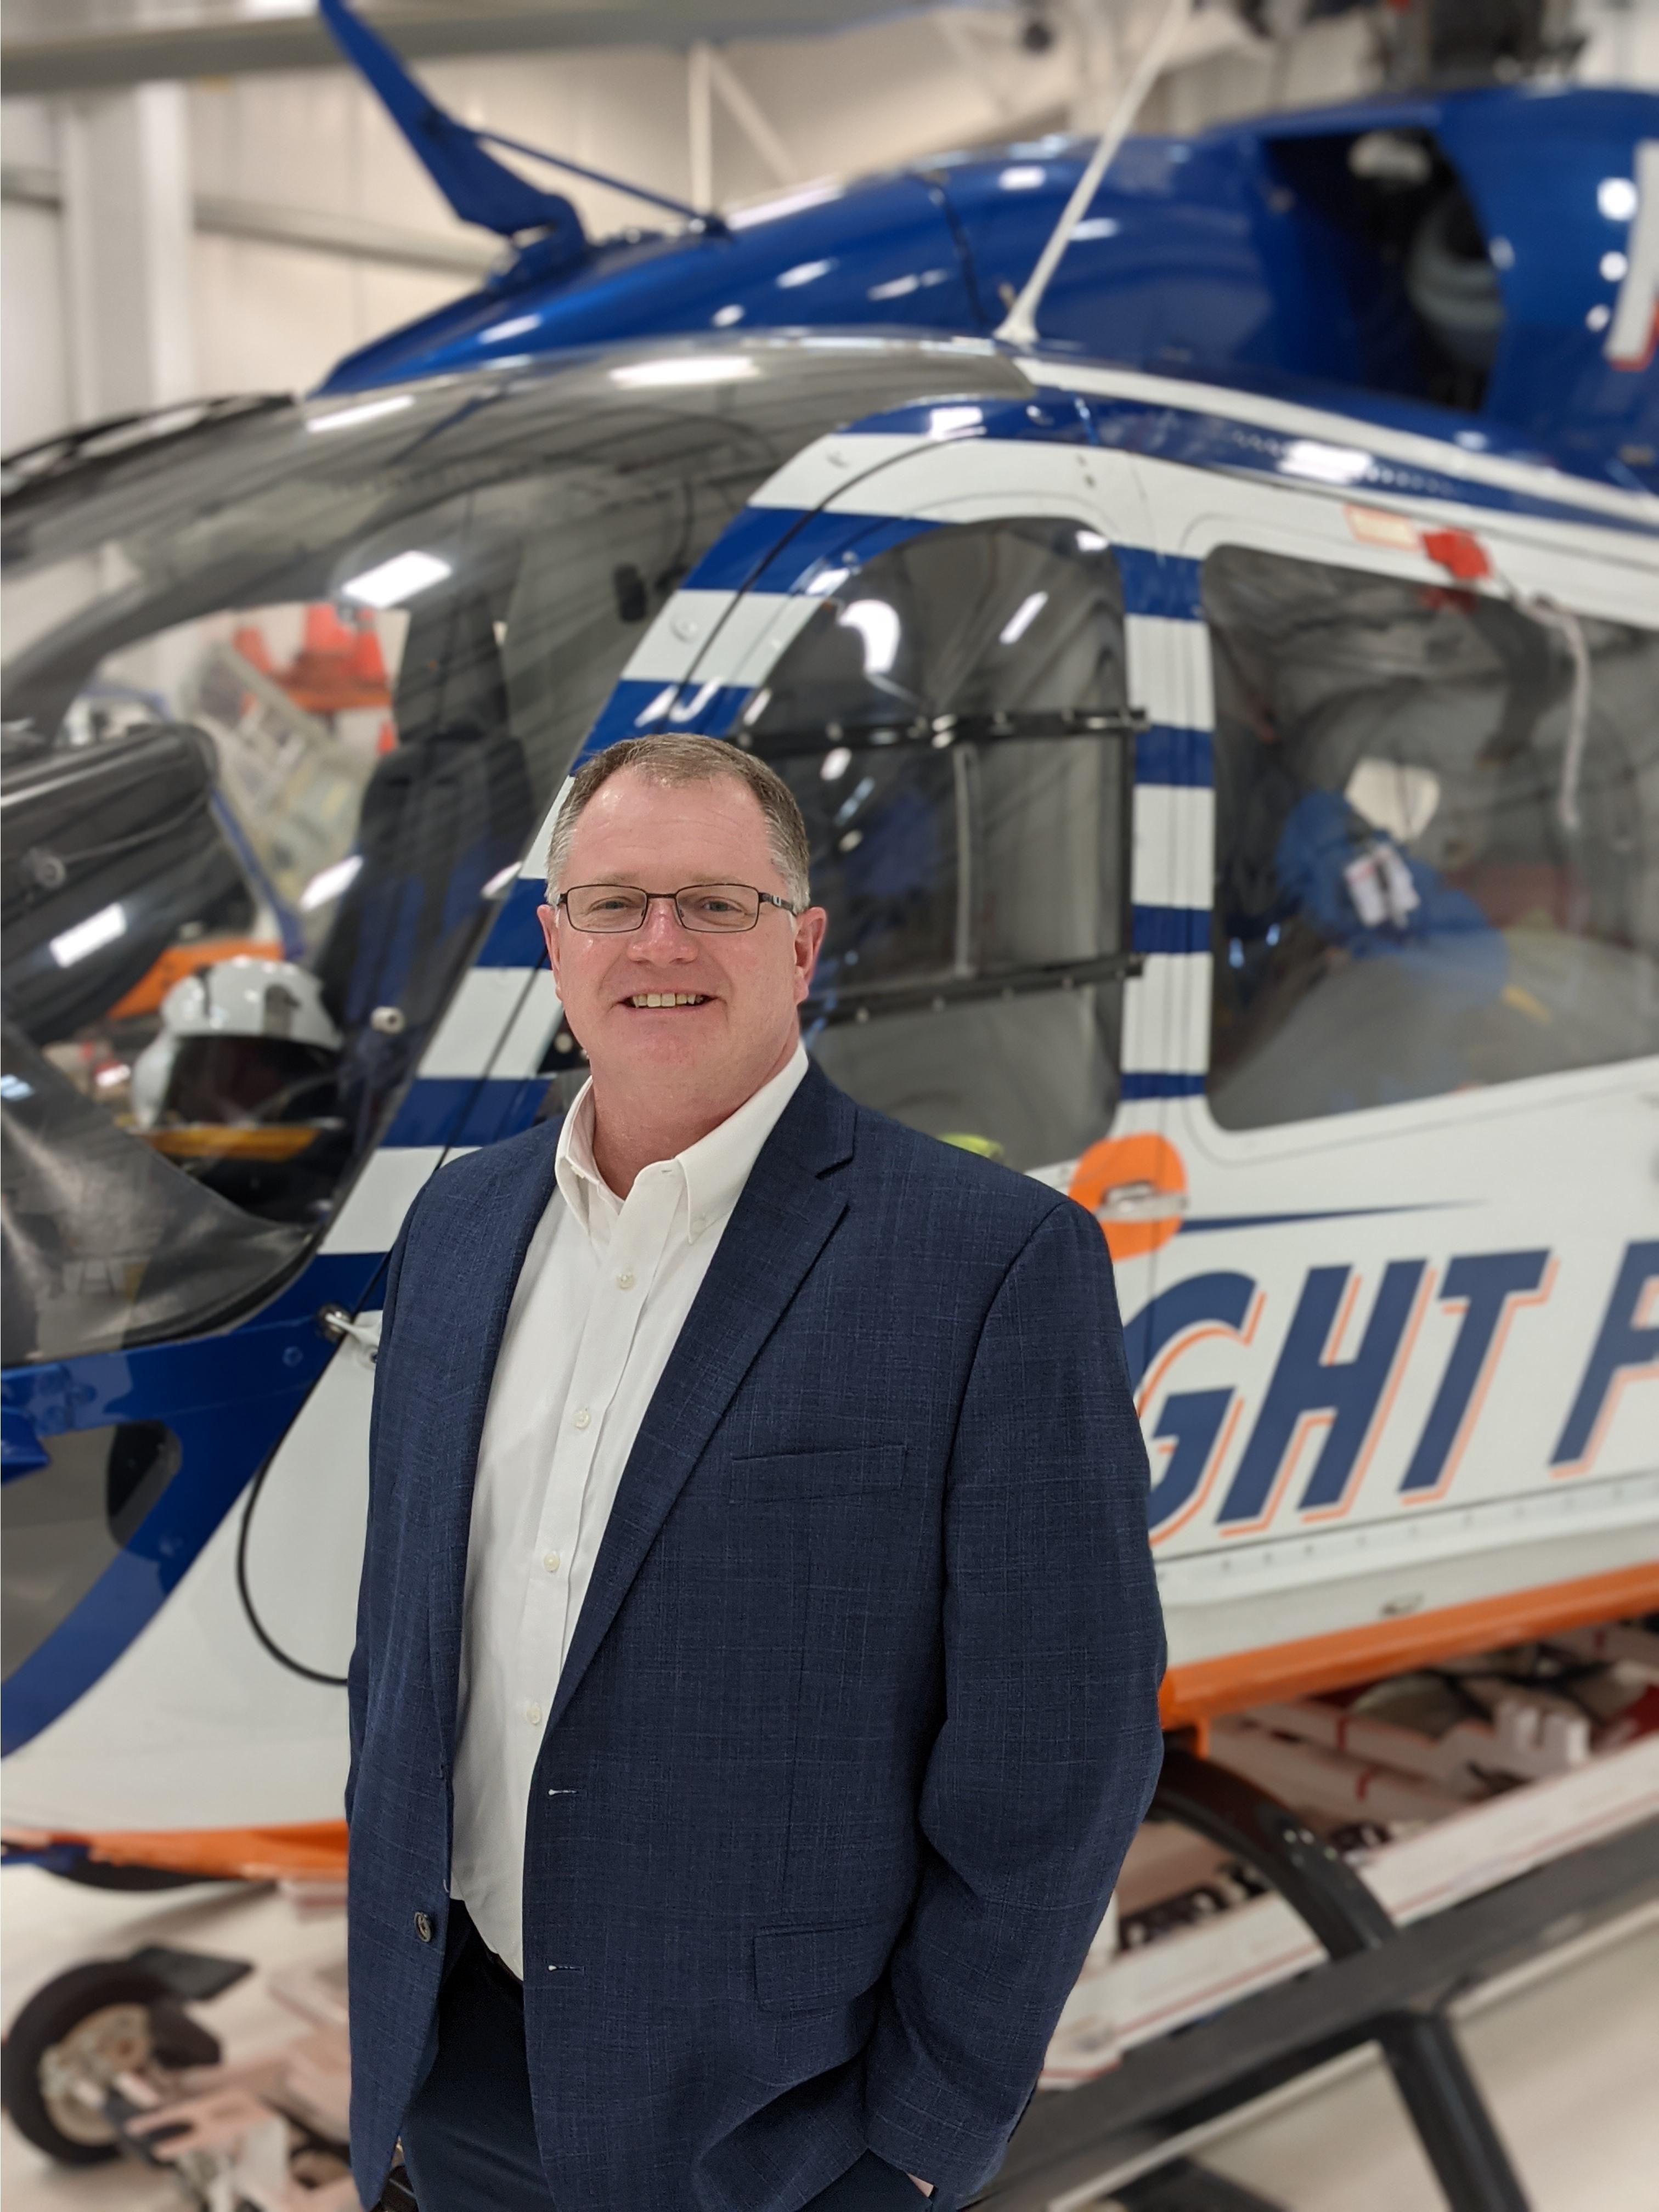 Flight for Life Announces New Executive Director